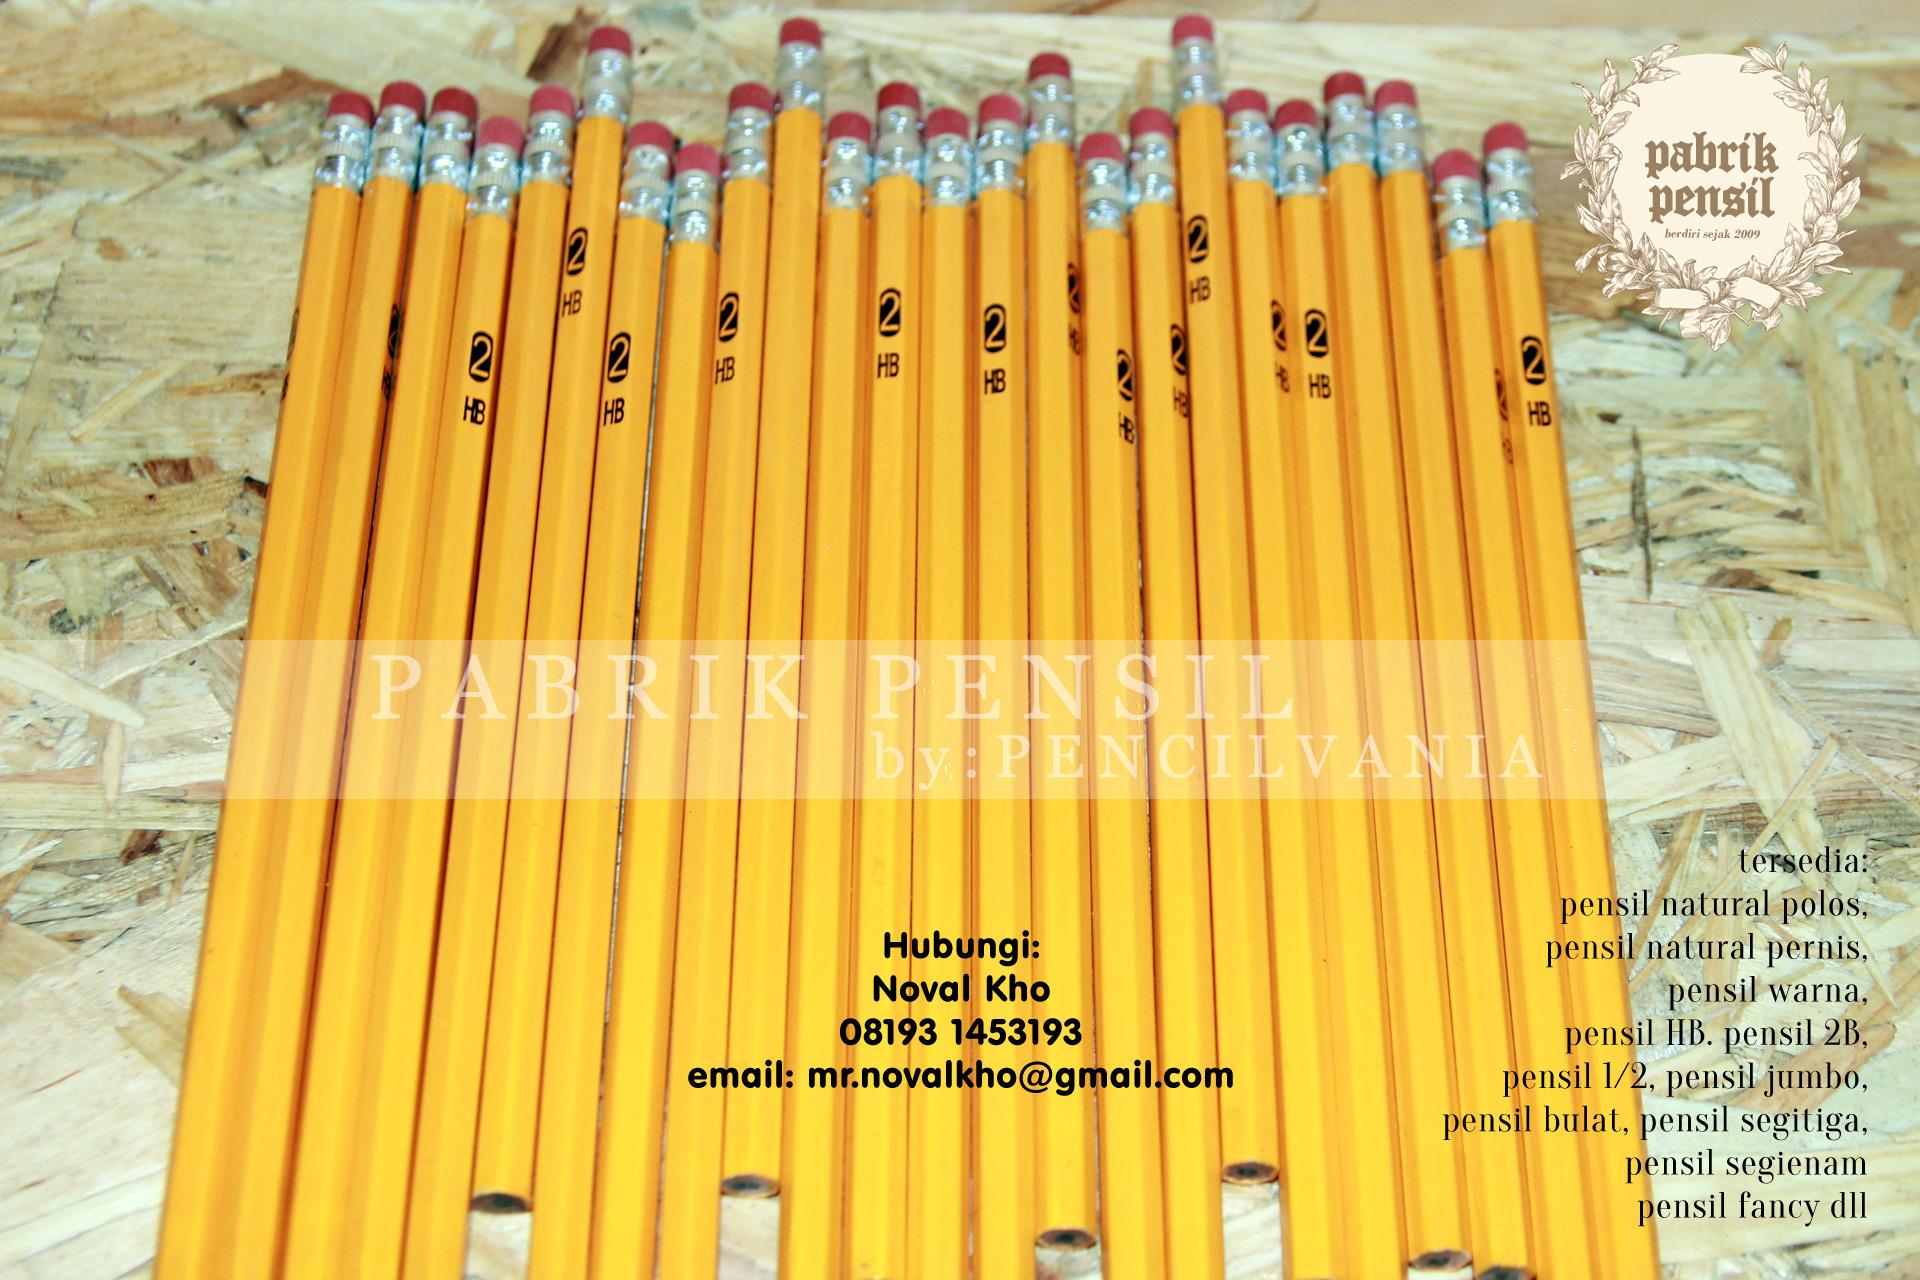 Album Google Pinsil Kayu Photo Pabrik Pensil Bandung Distributor Murah Supplier